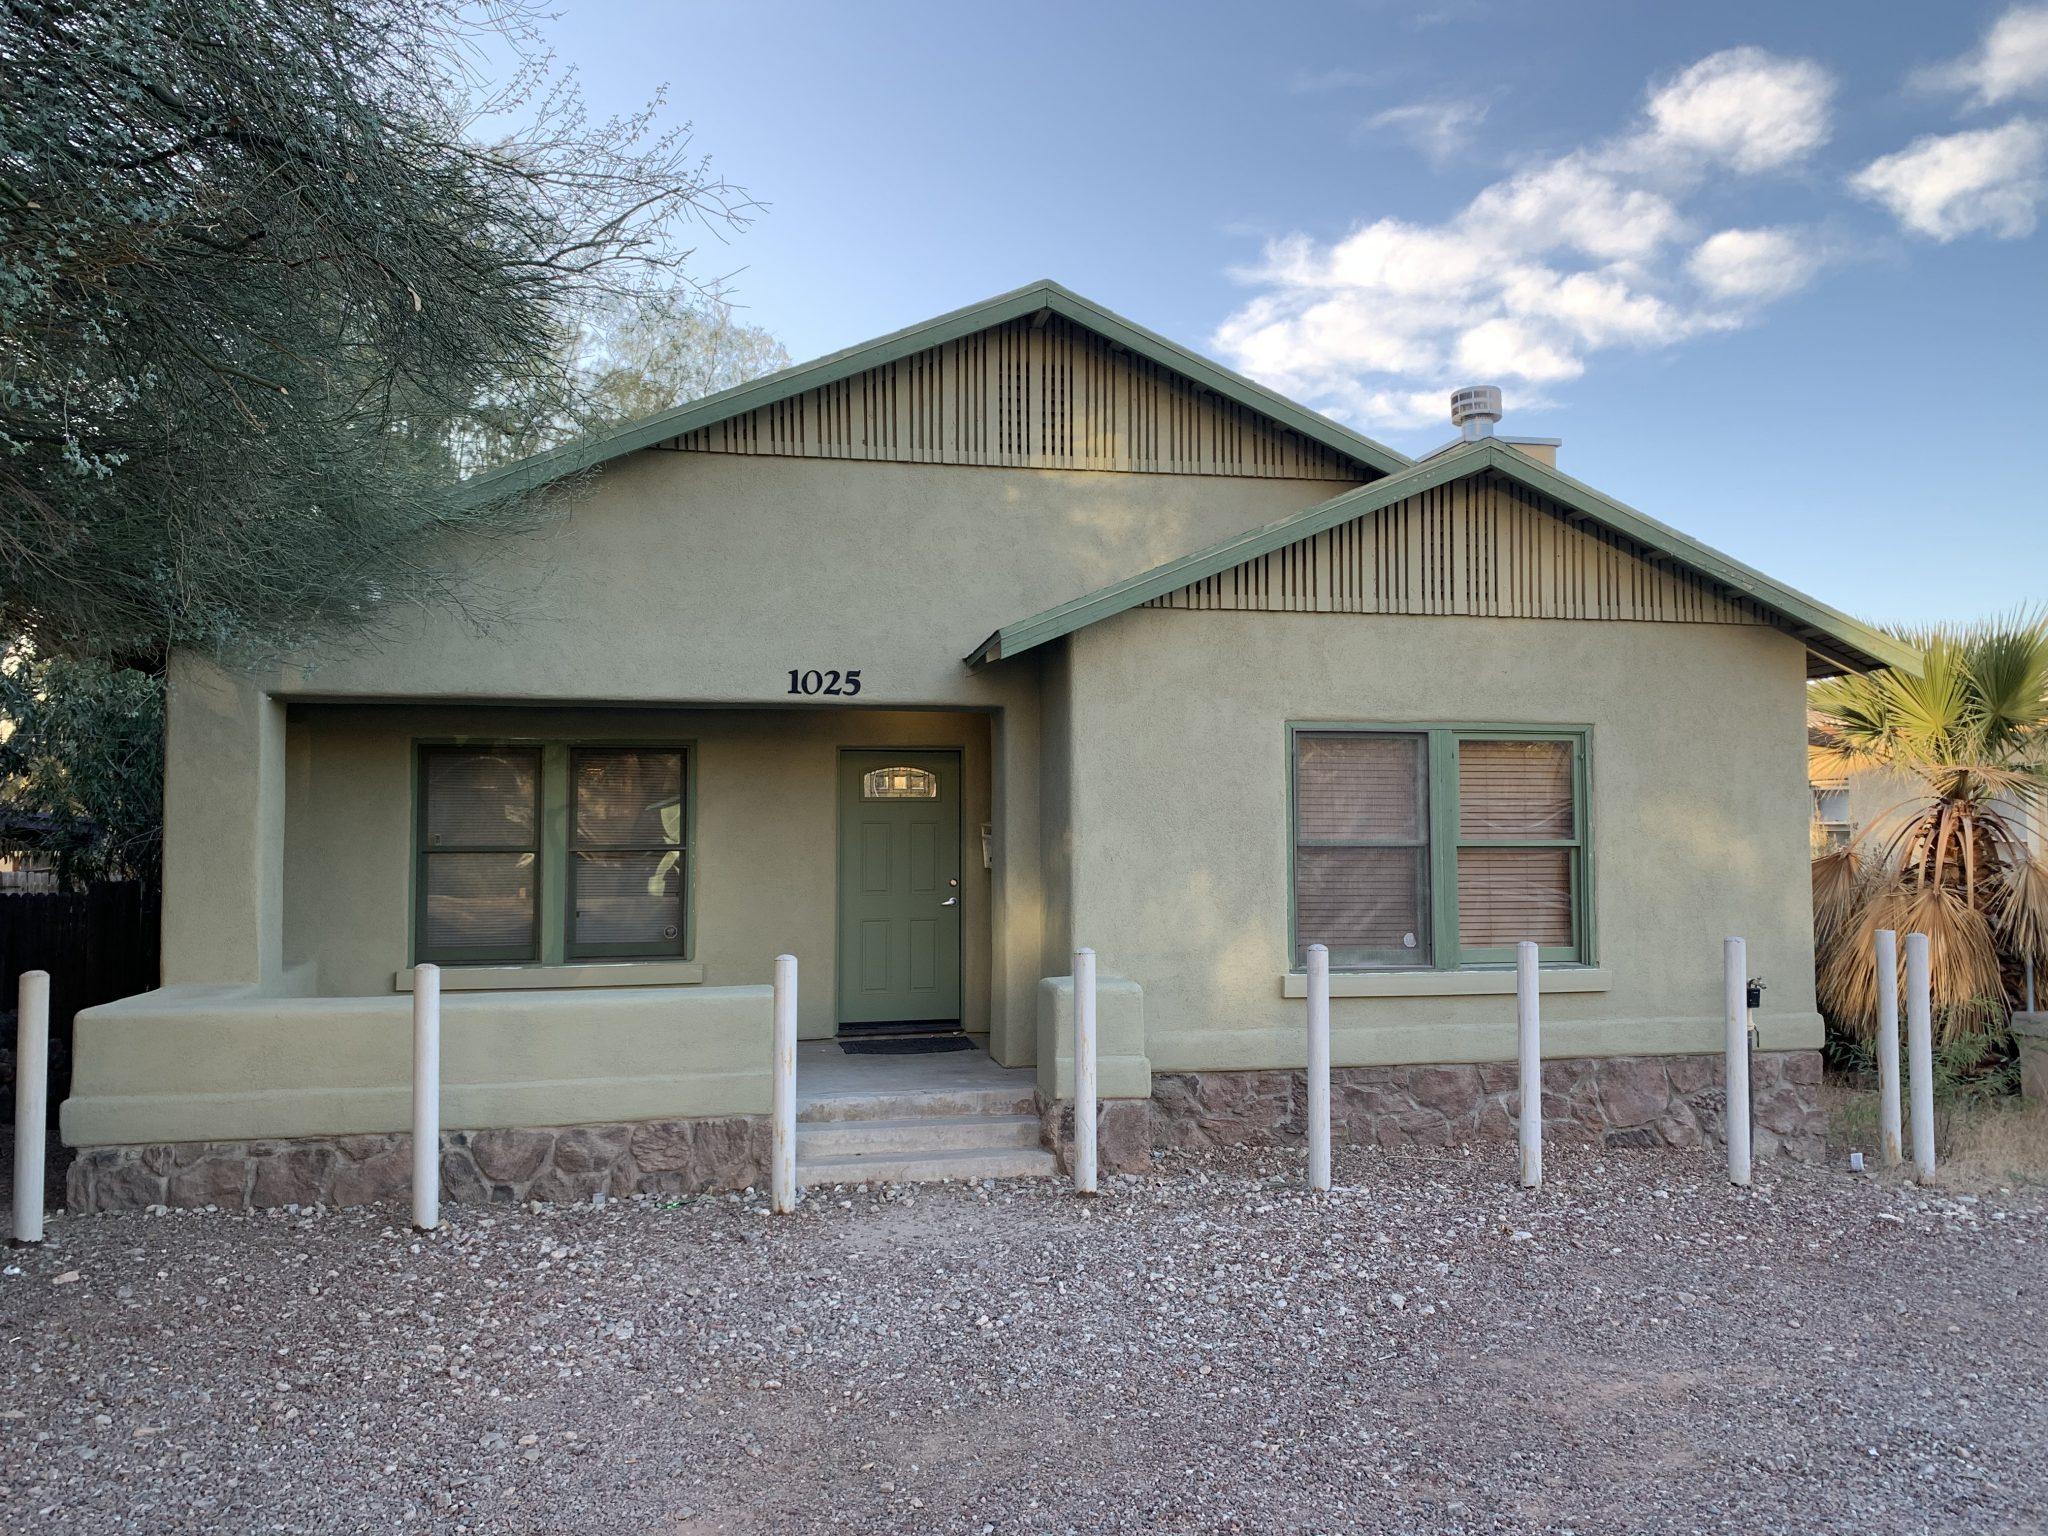 6 Bedroom Tucson Rental Home For Sale